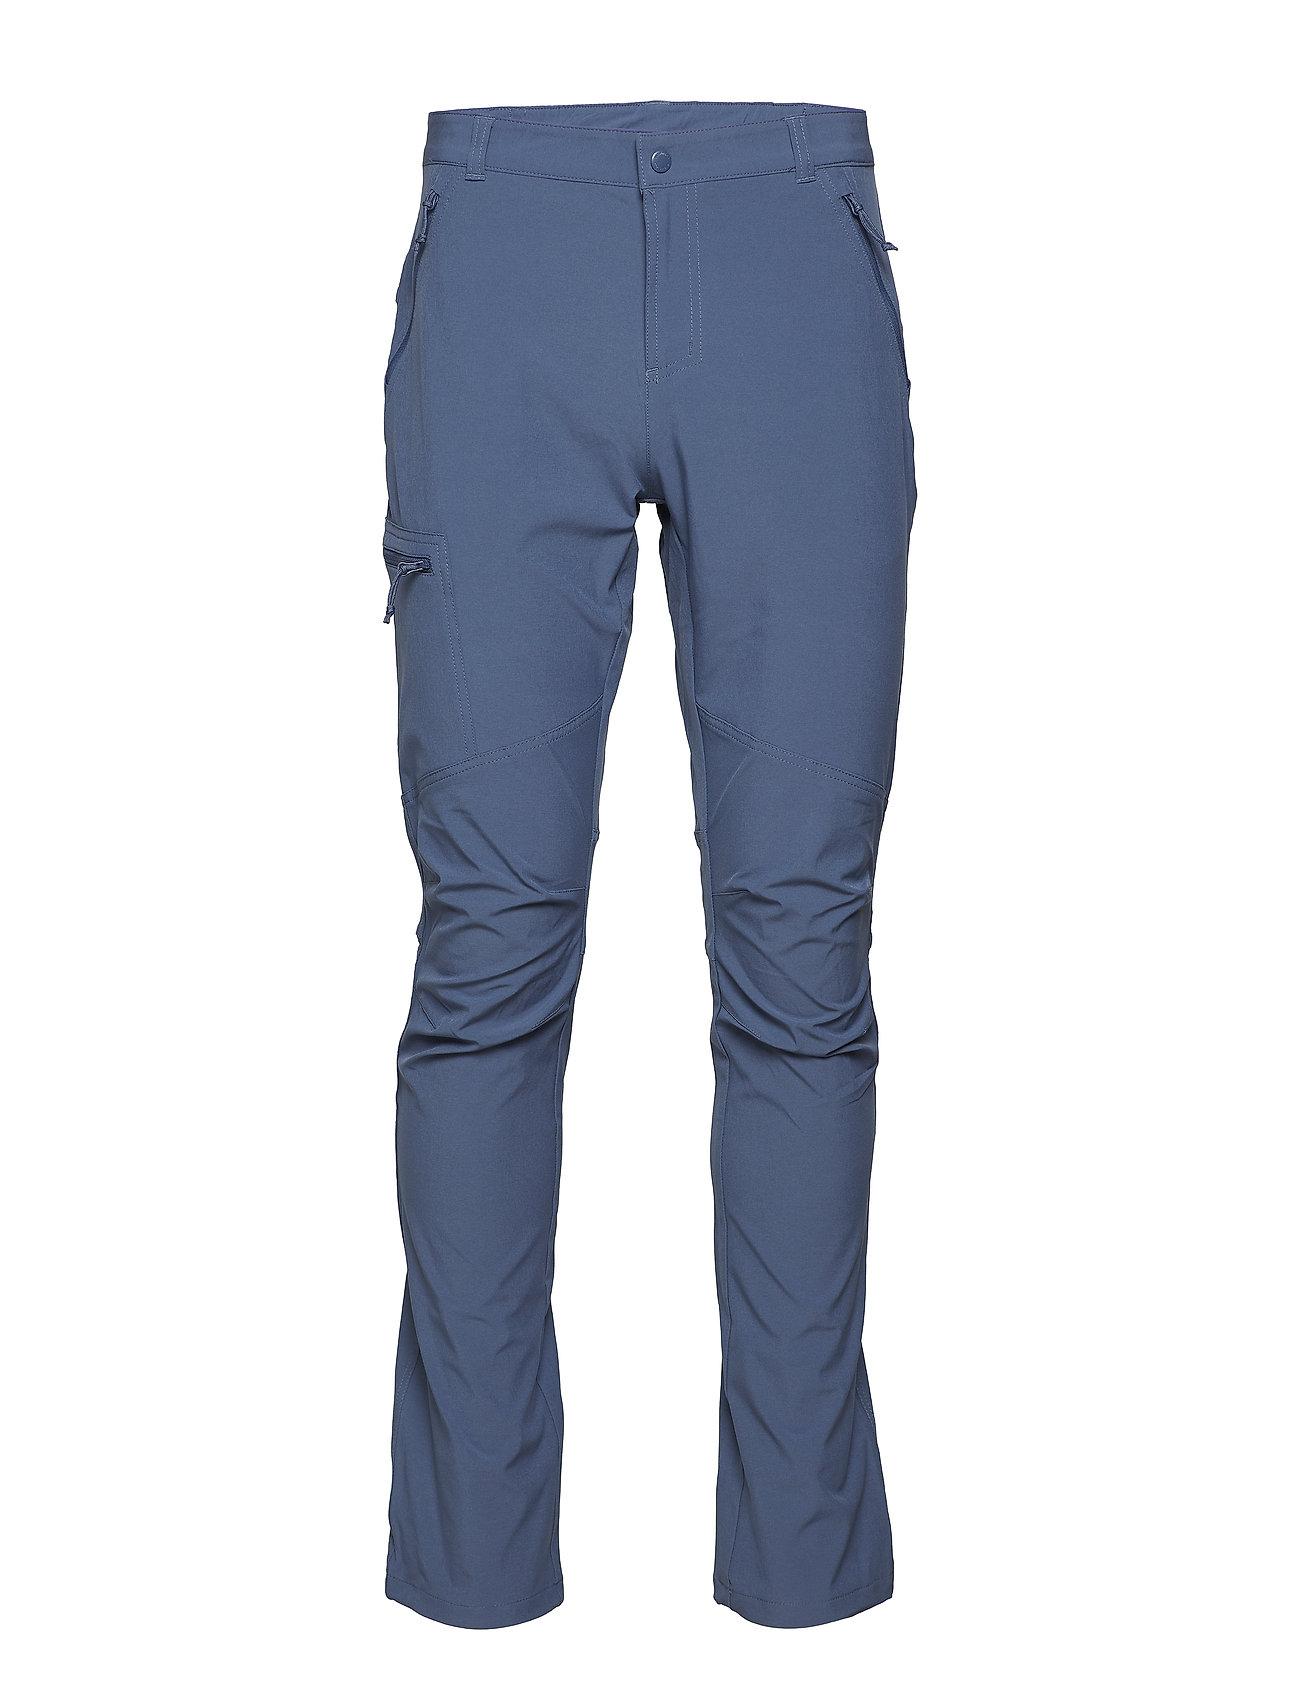 Image of Triple Canyon™ Pant Sport Pants Blå Columbia (3068084607)